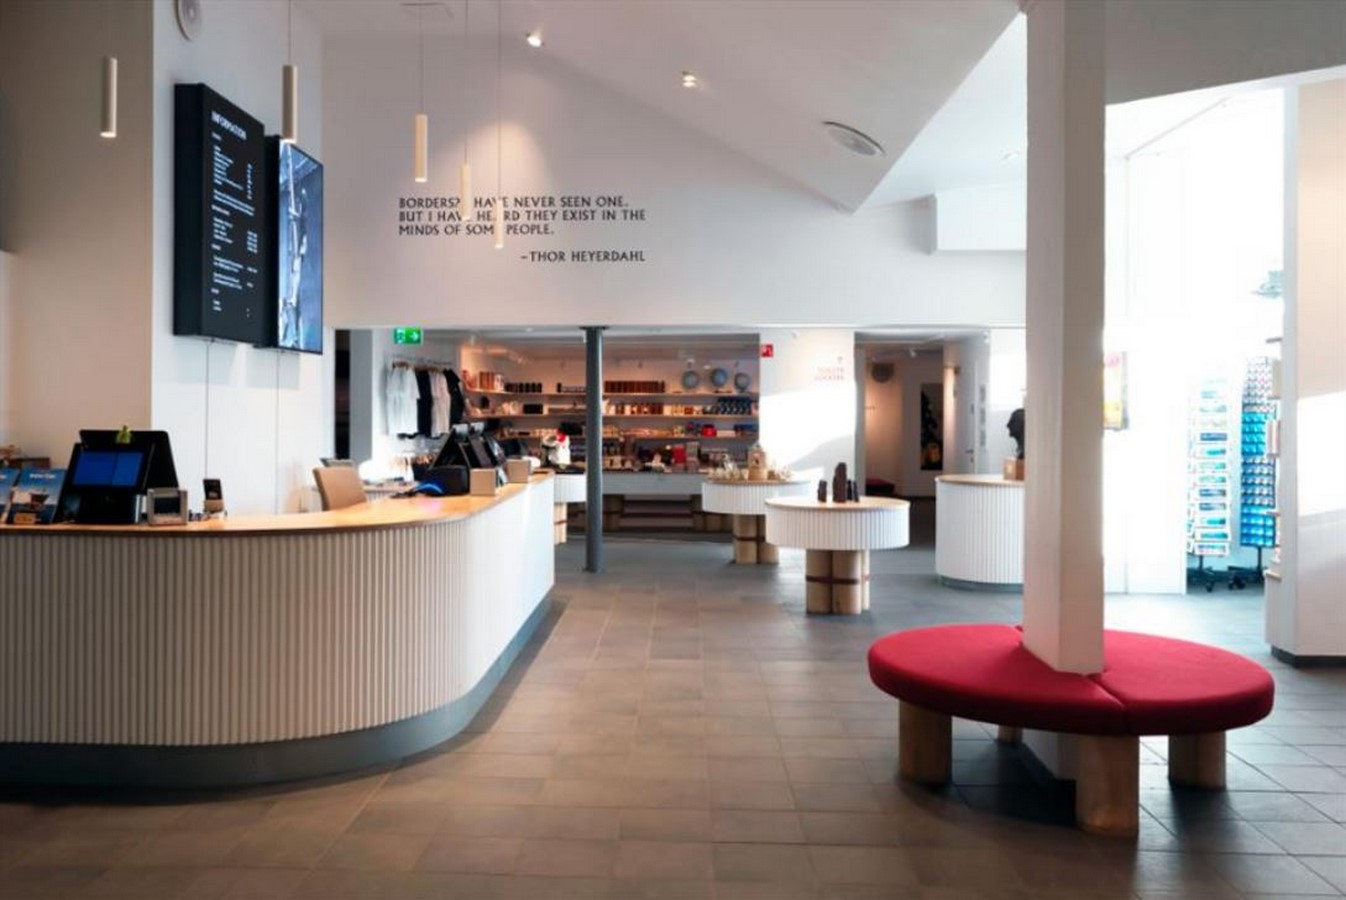 Sky-facing auditorium to Kon-Tiki Museum in Oslo to be added by Snøhetta - Sheet5